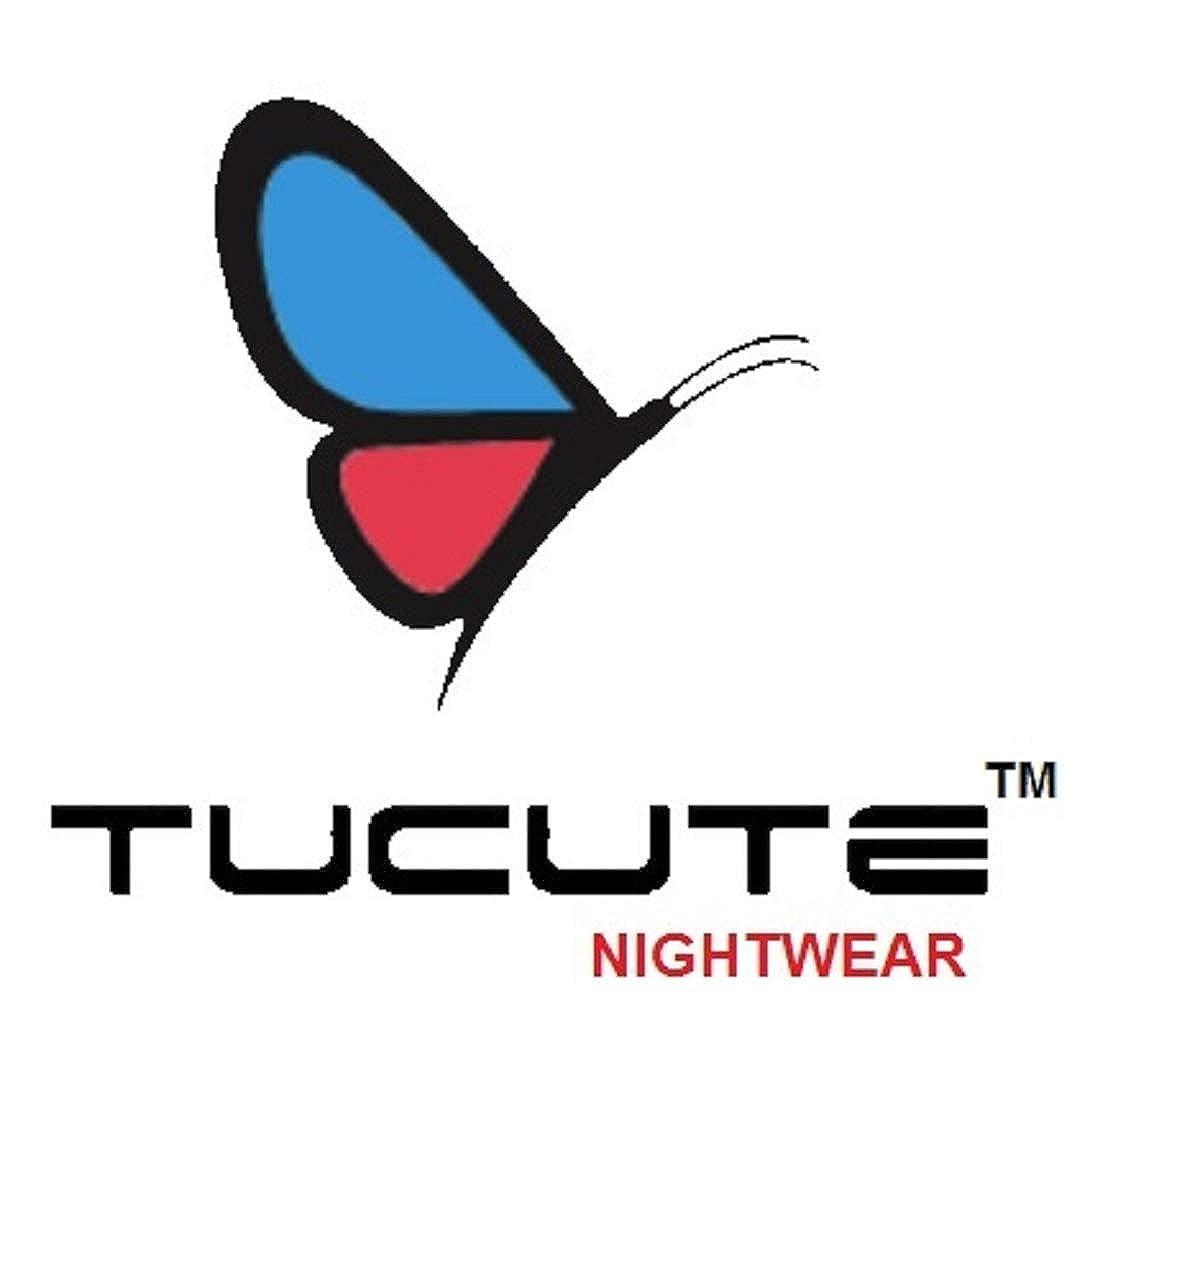 TUCUTE Womens Premium Cotton Fabric Nighty Night Gown Nightwear Nightdress  with Leaf Print. (Magenta-Sky Blue-2695 3e92b8336